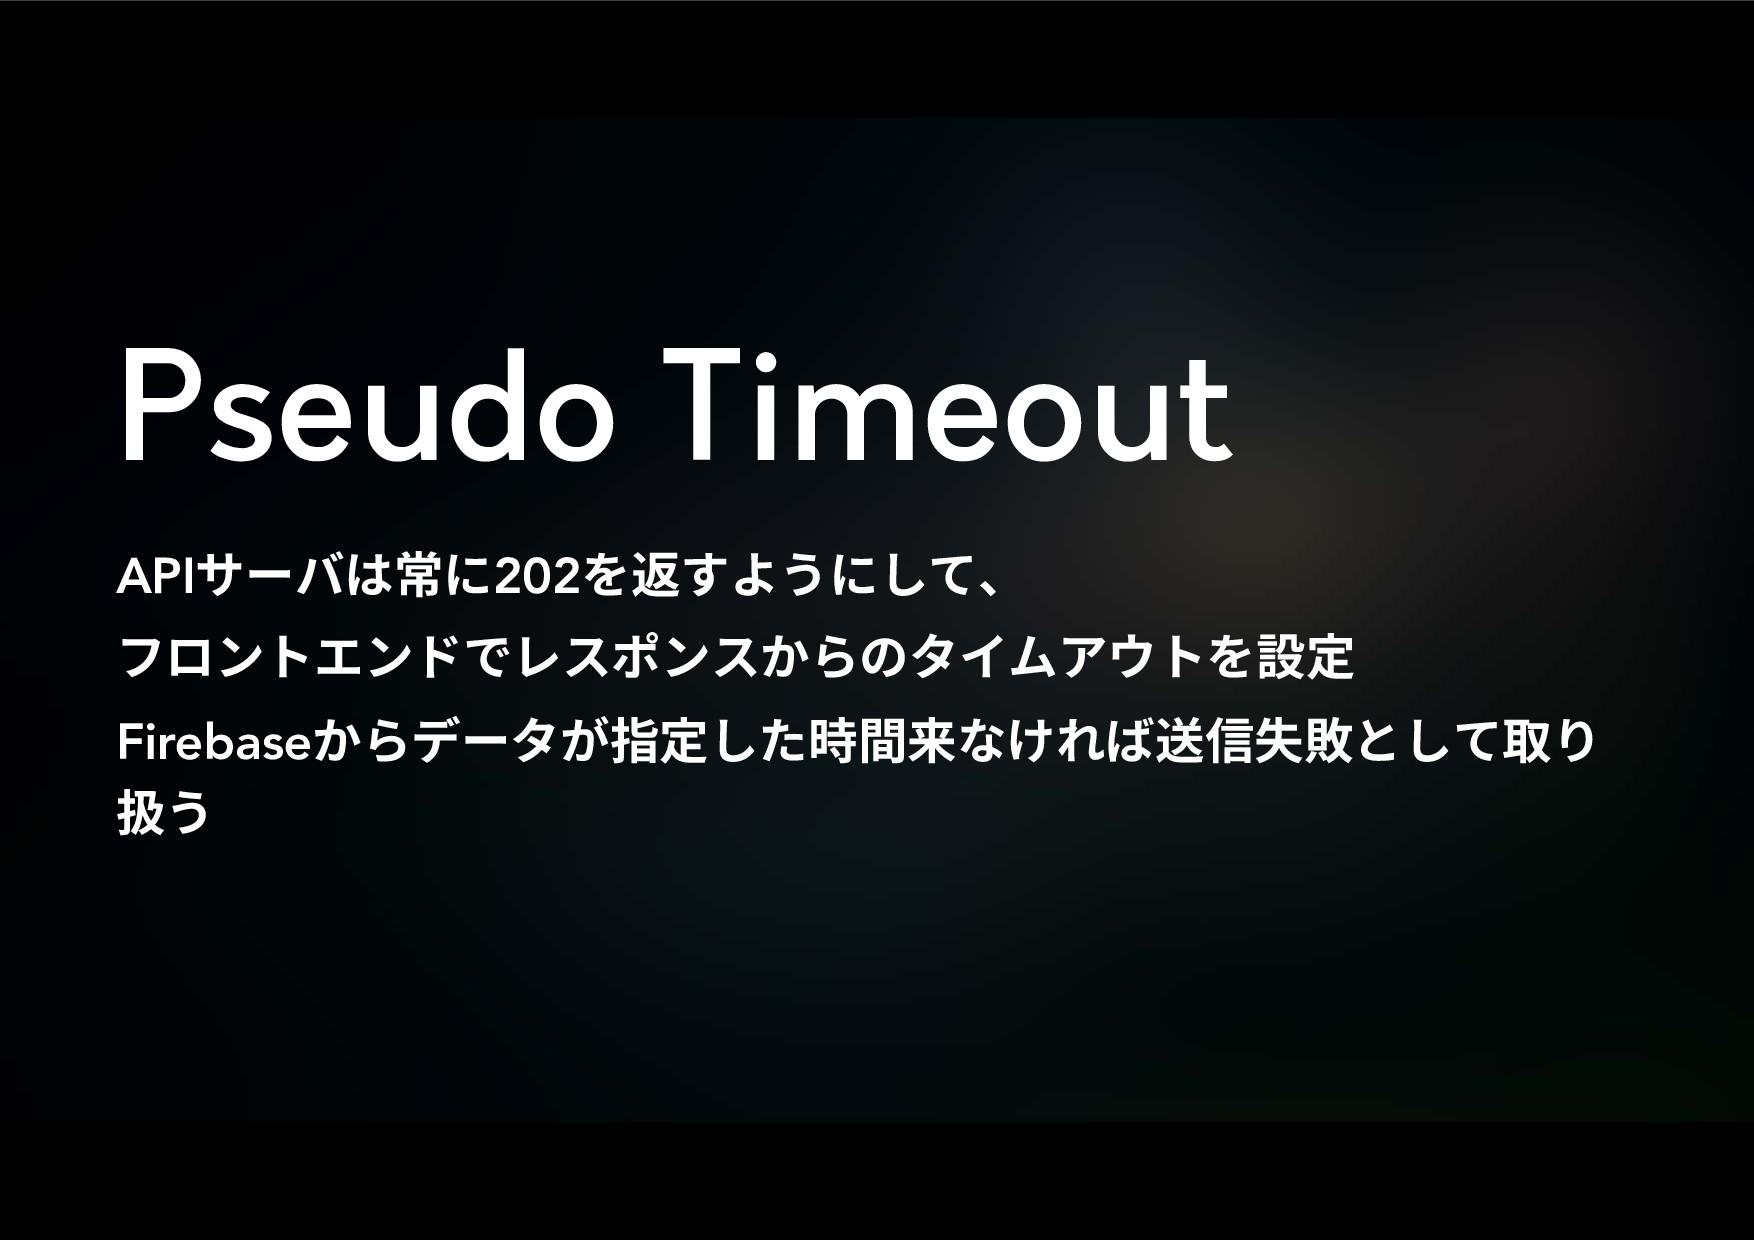 Pseudo Timeout API؟٦غכ䌢ח202鵤ׅ״ֲח׃גծ ؿٗٝزؒٝسדٖ...